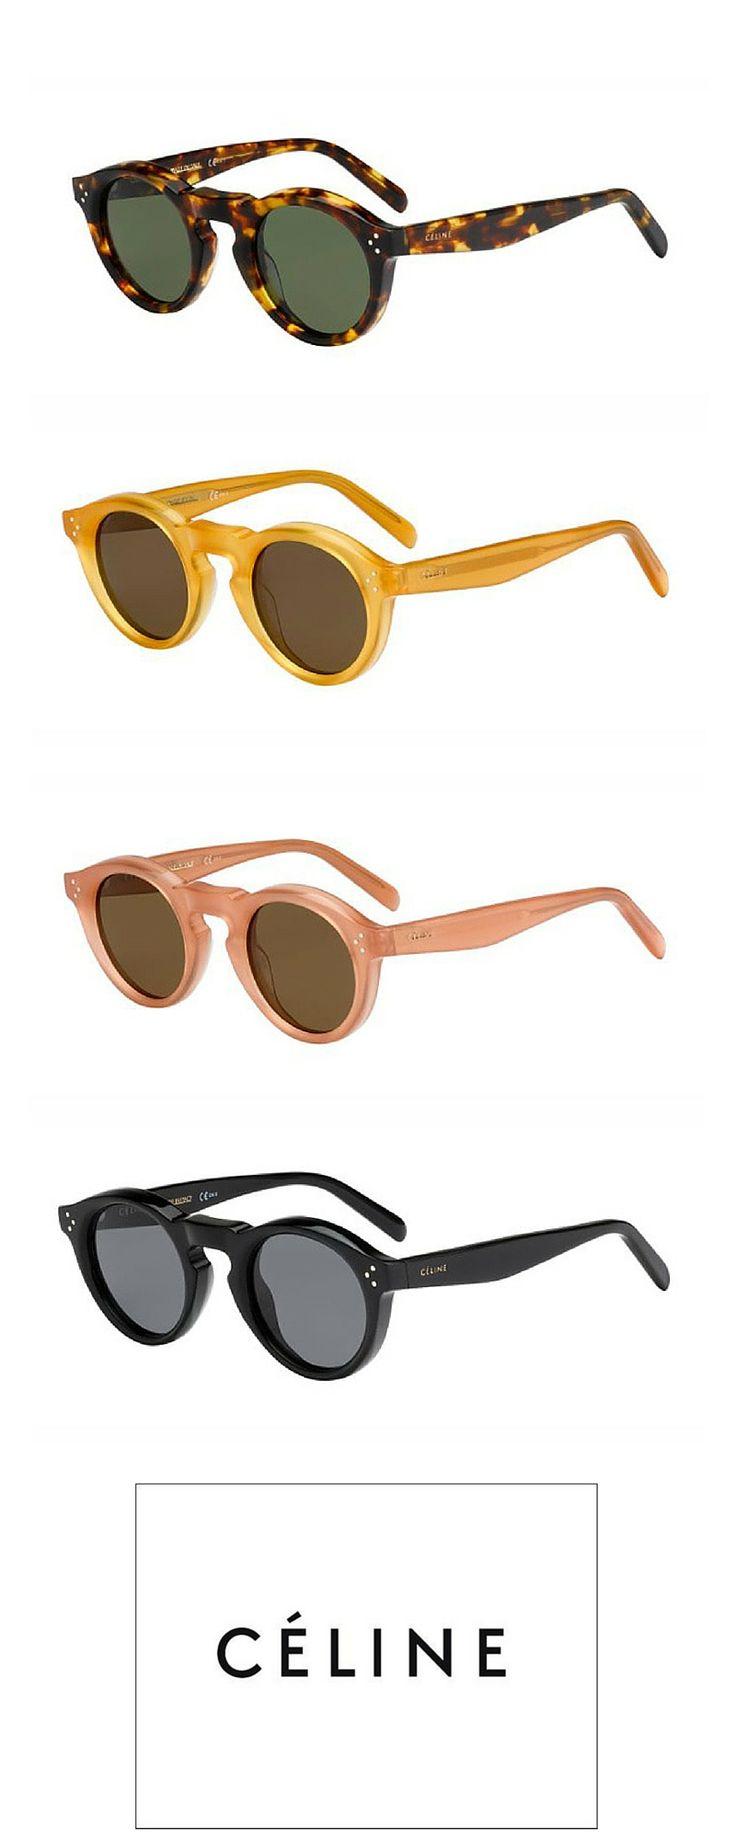 176 best images about Céline Eyewear on Pinterest